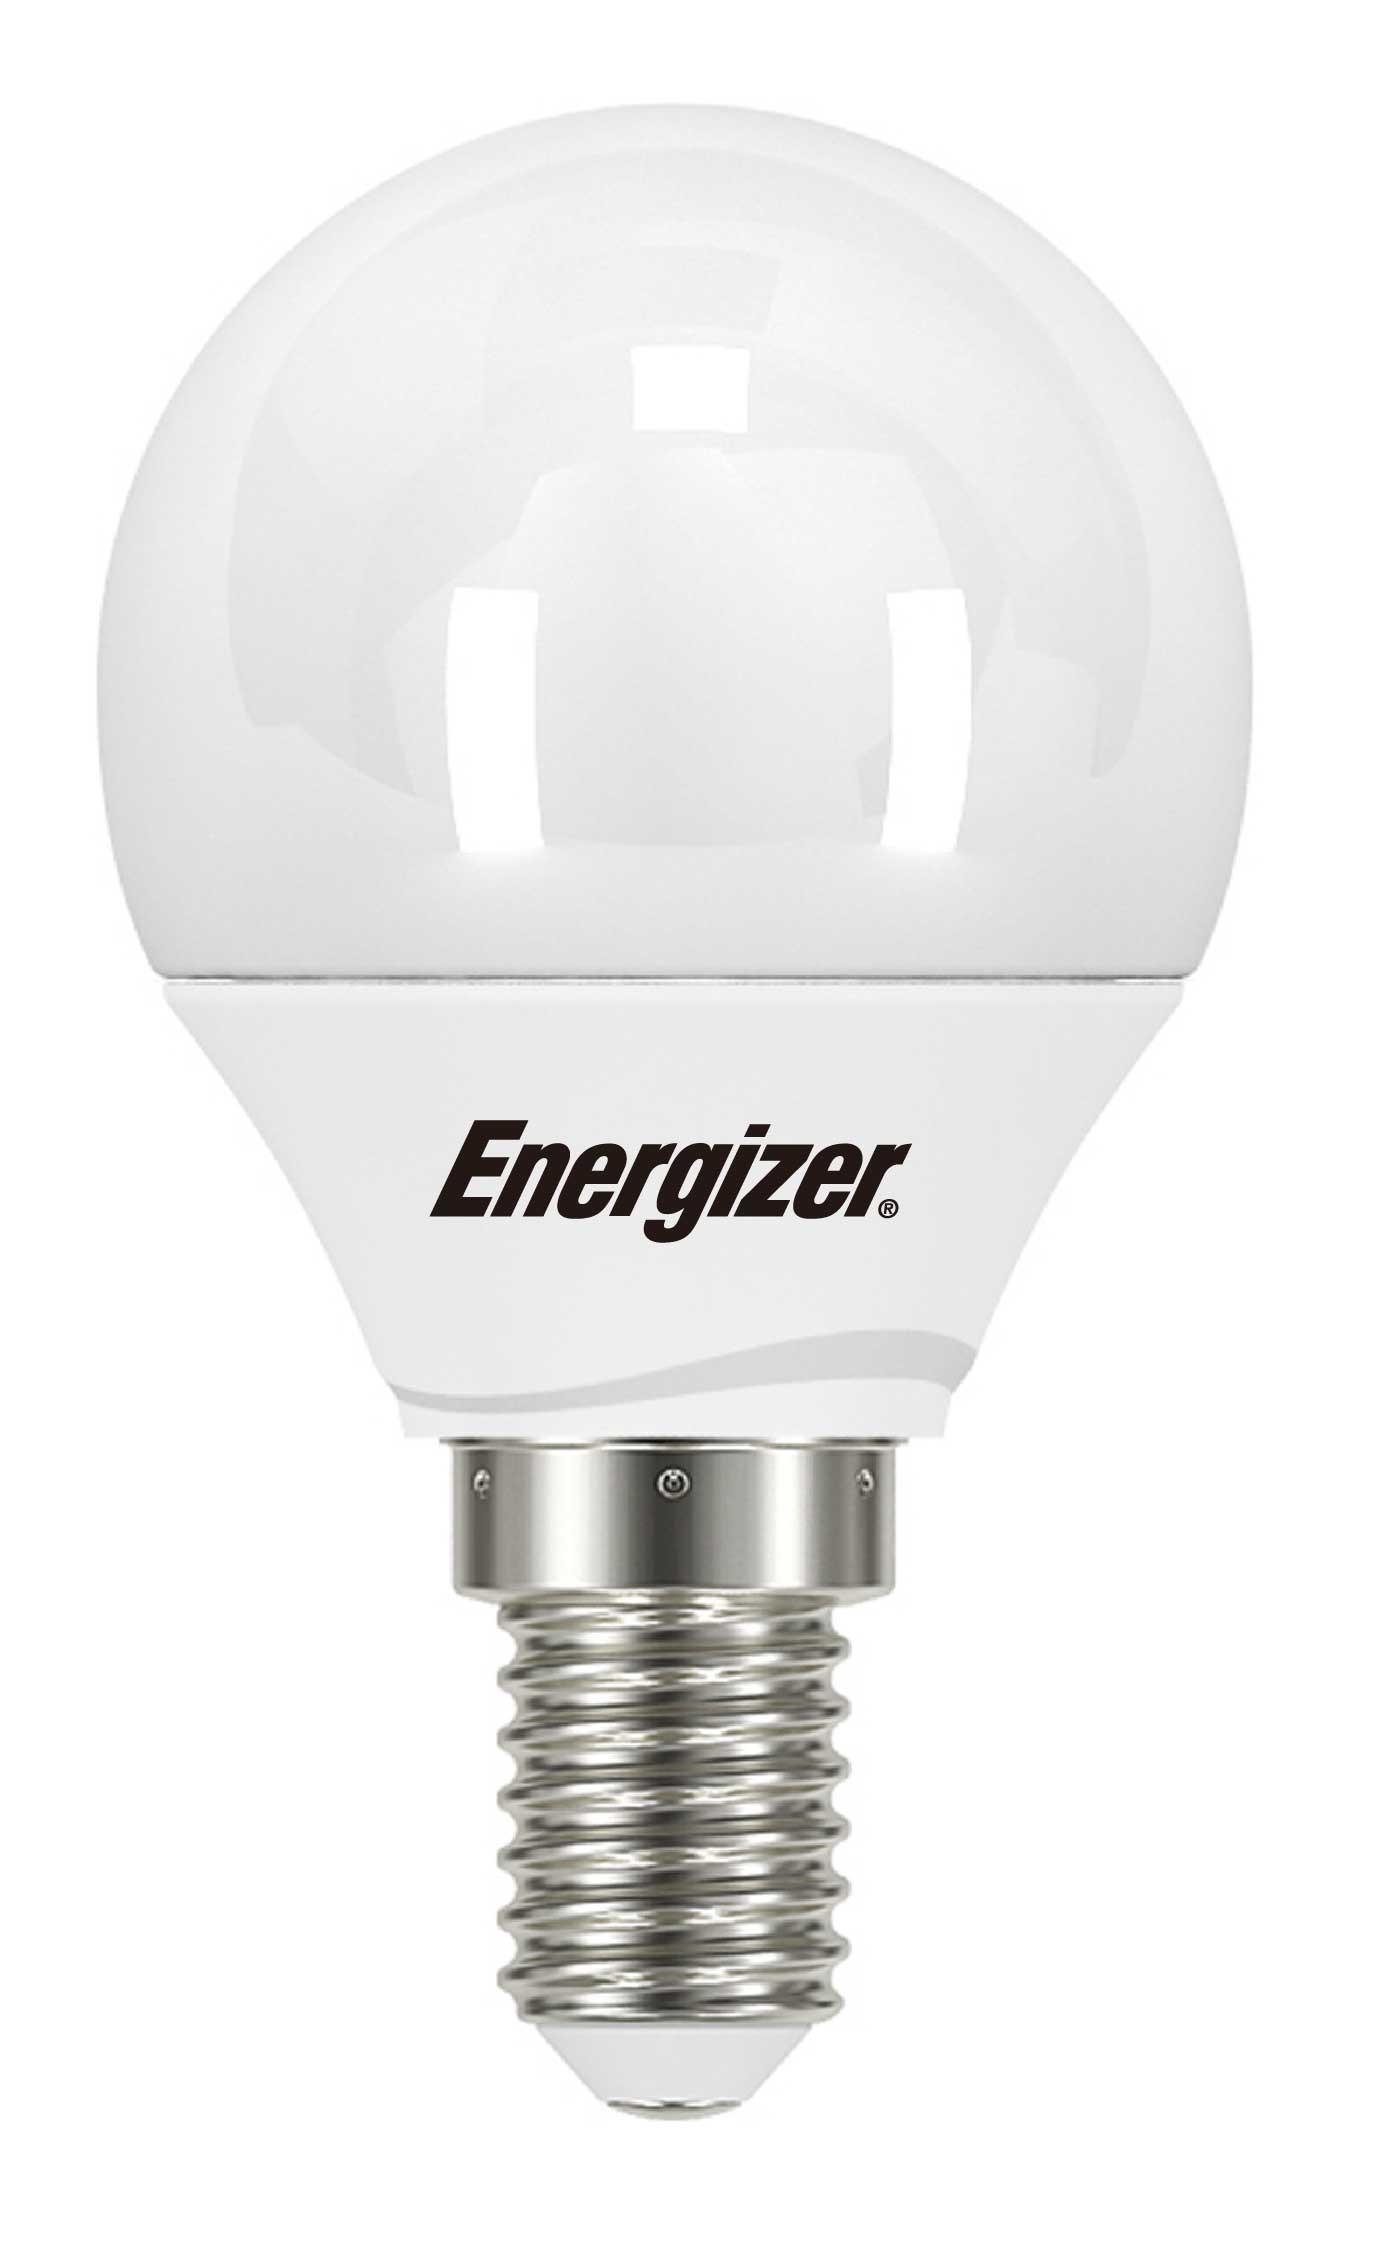 LED mini globe 5,9W (40W) E14, ENERGIZER, teplá bílá